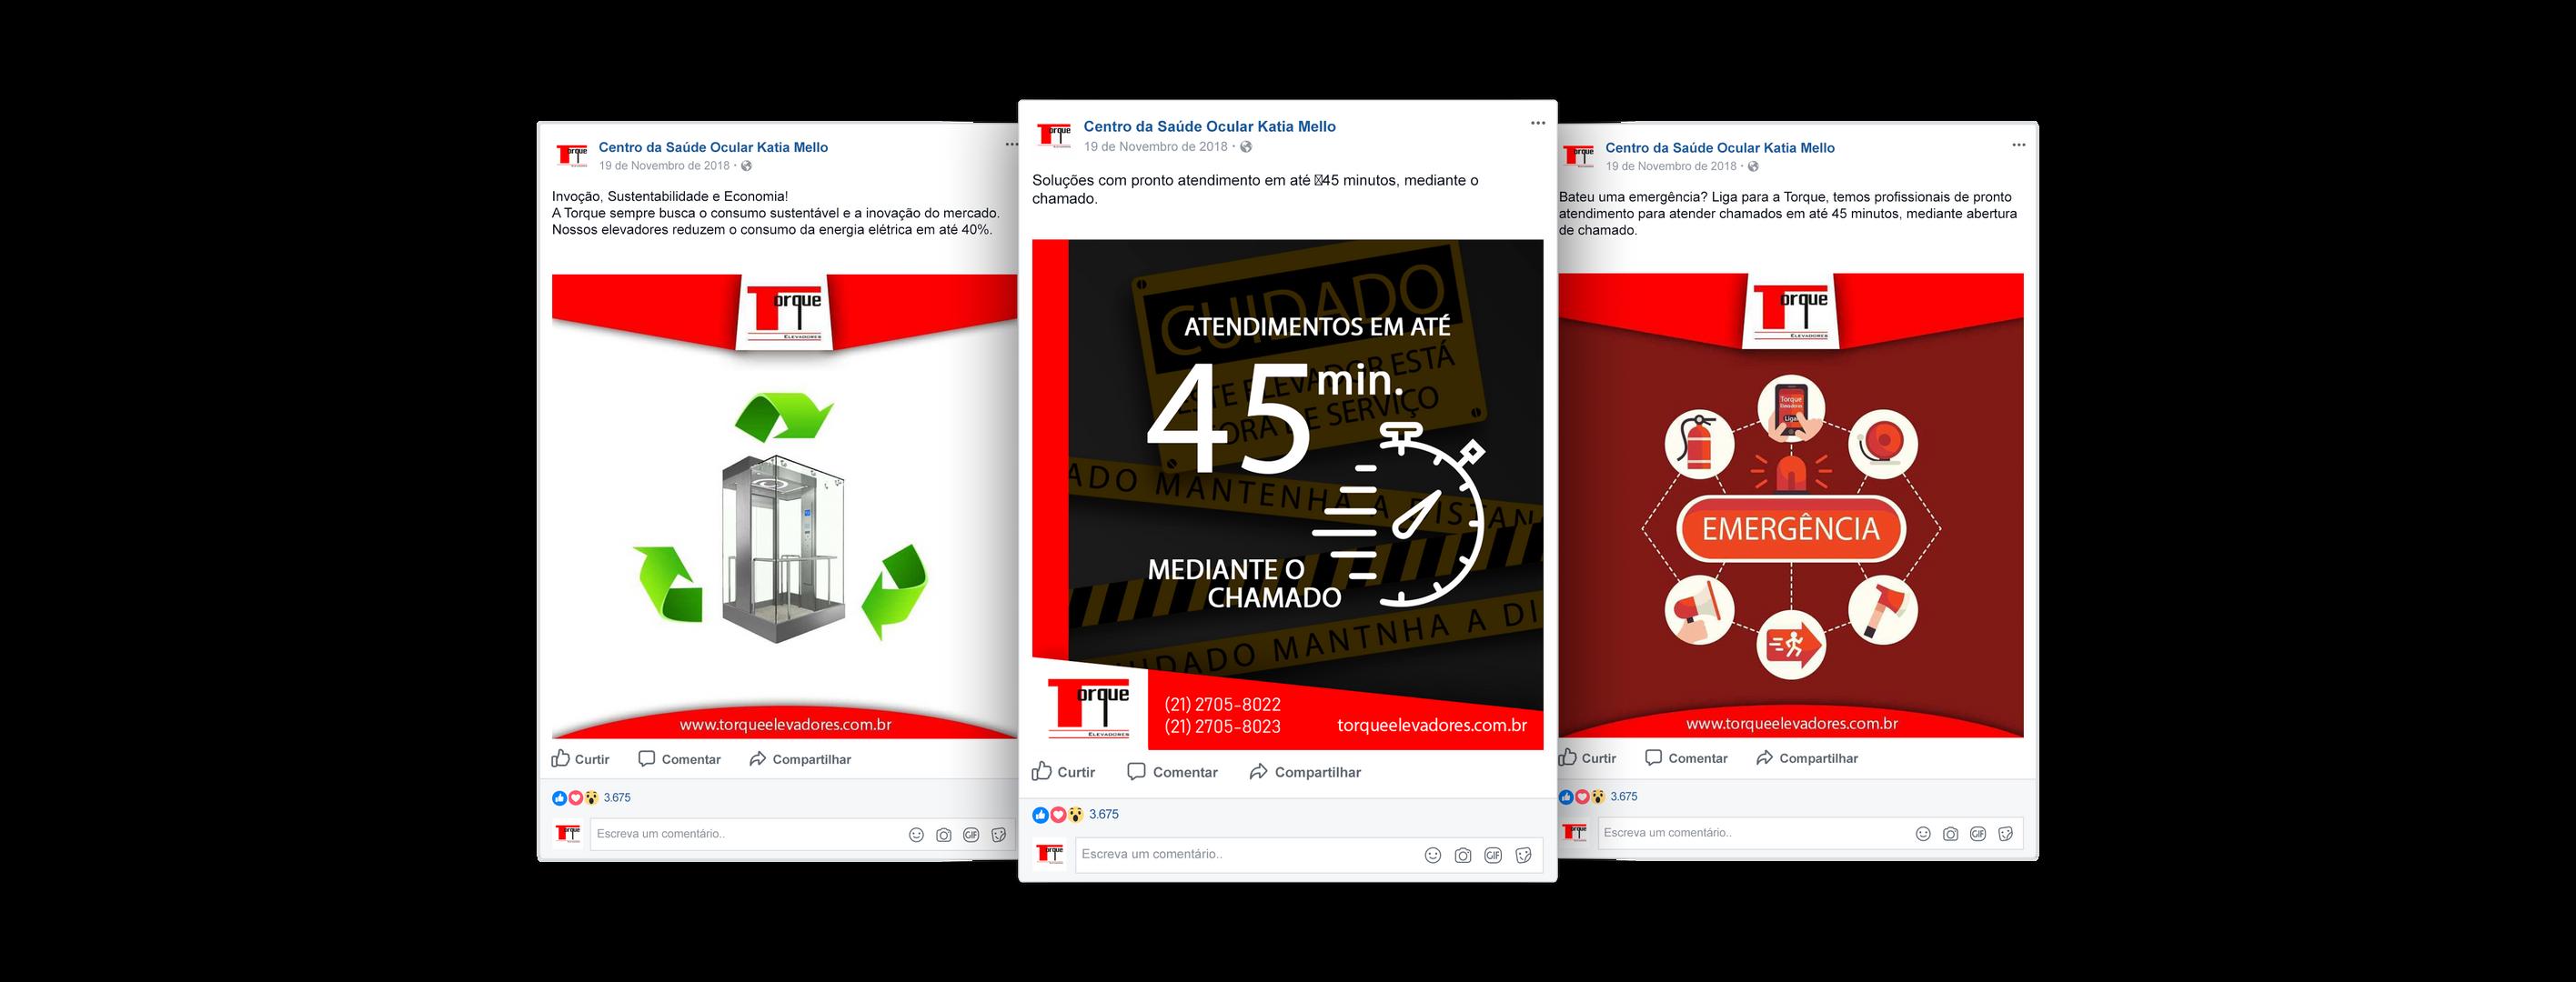 Facebook-Post-torque-1.png